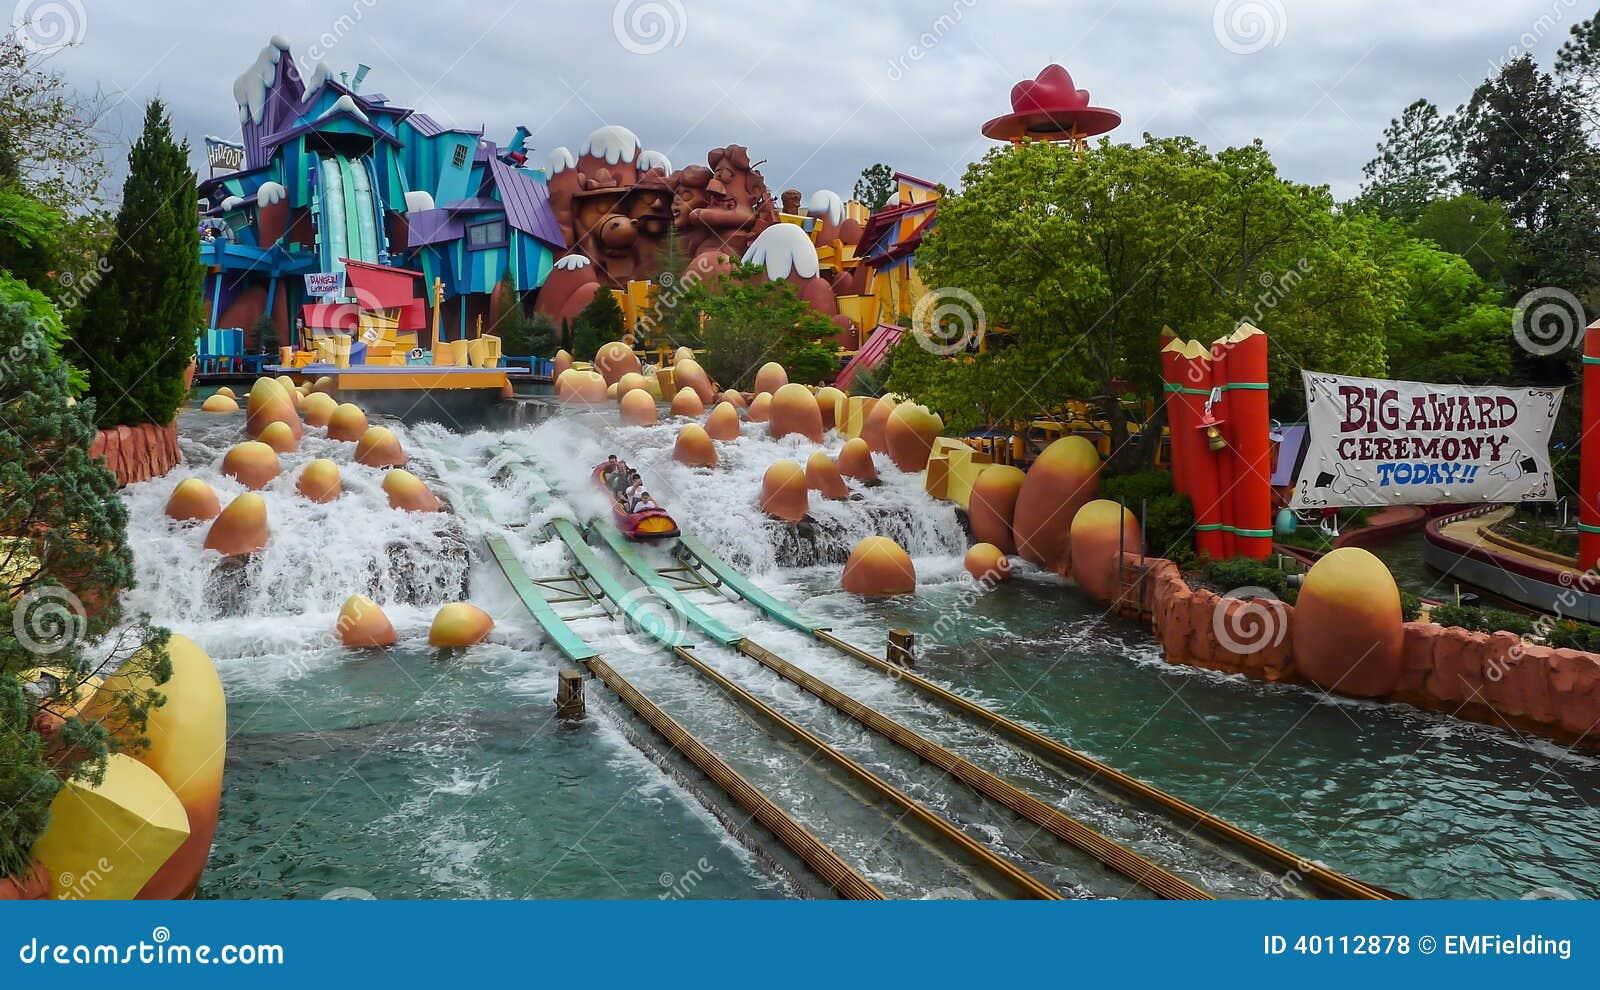 Flume Ride At Universal Studios Islands Of Adventure Editorial Stock Photo Image Of Park Amusement 40112878